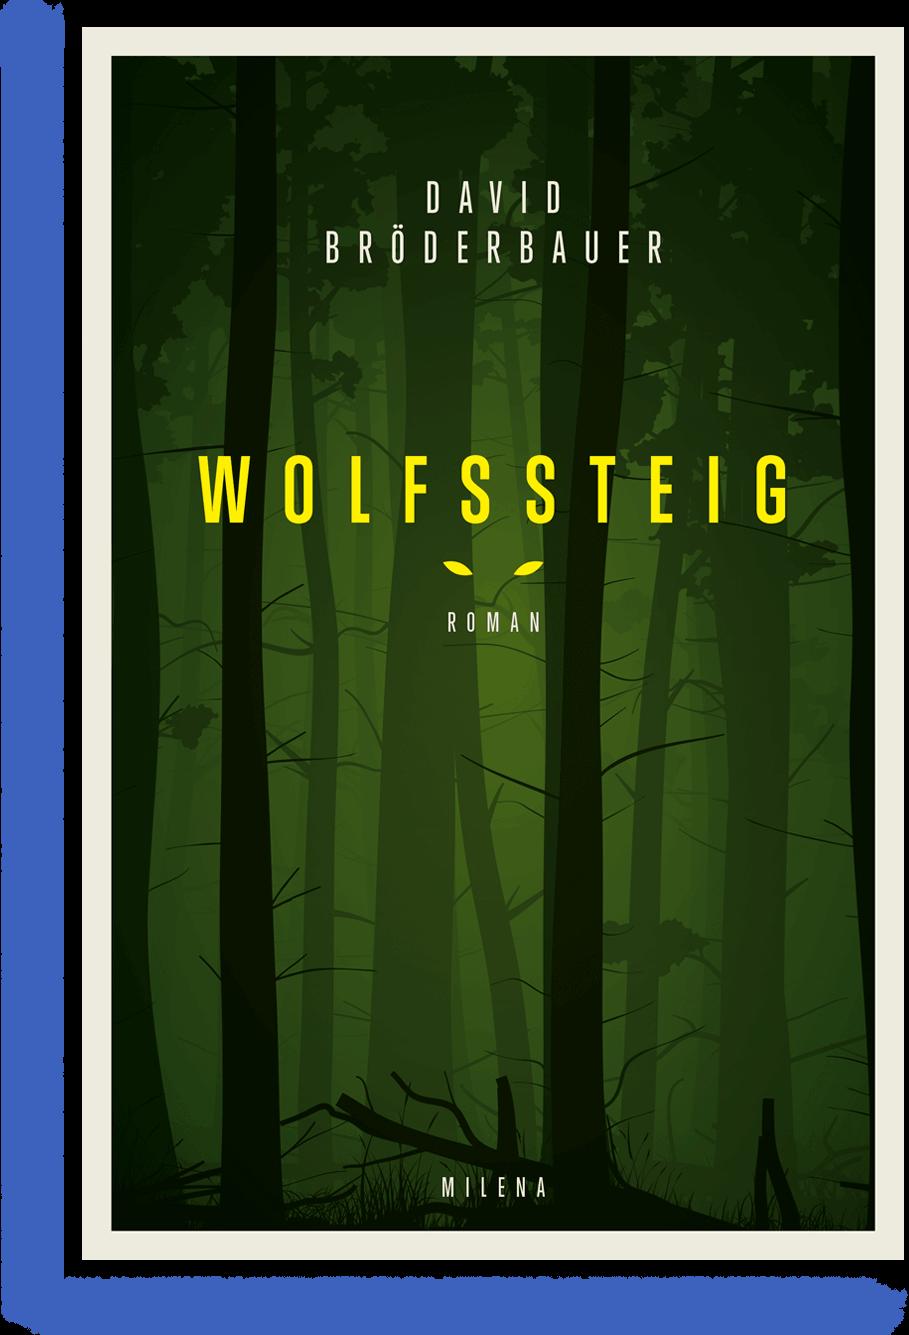 Buch cover Wolfssteig